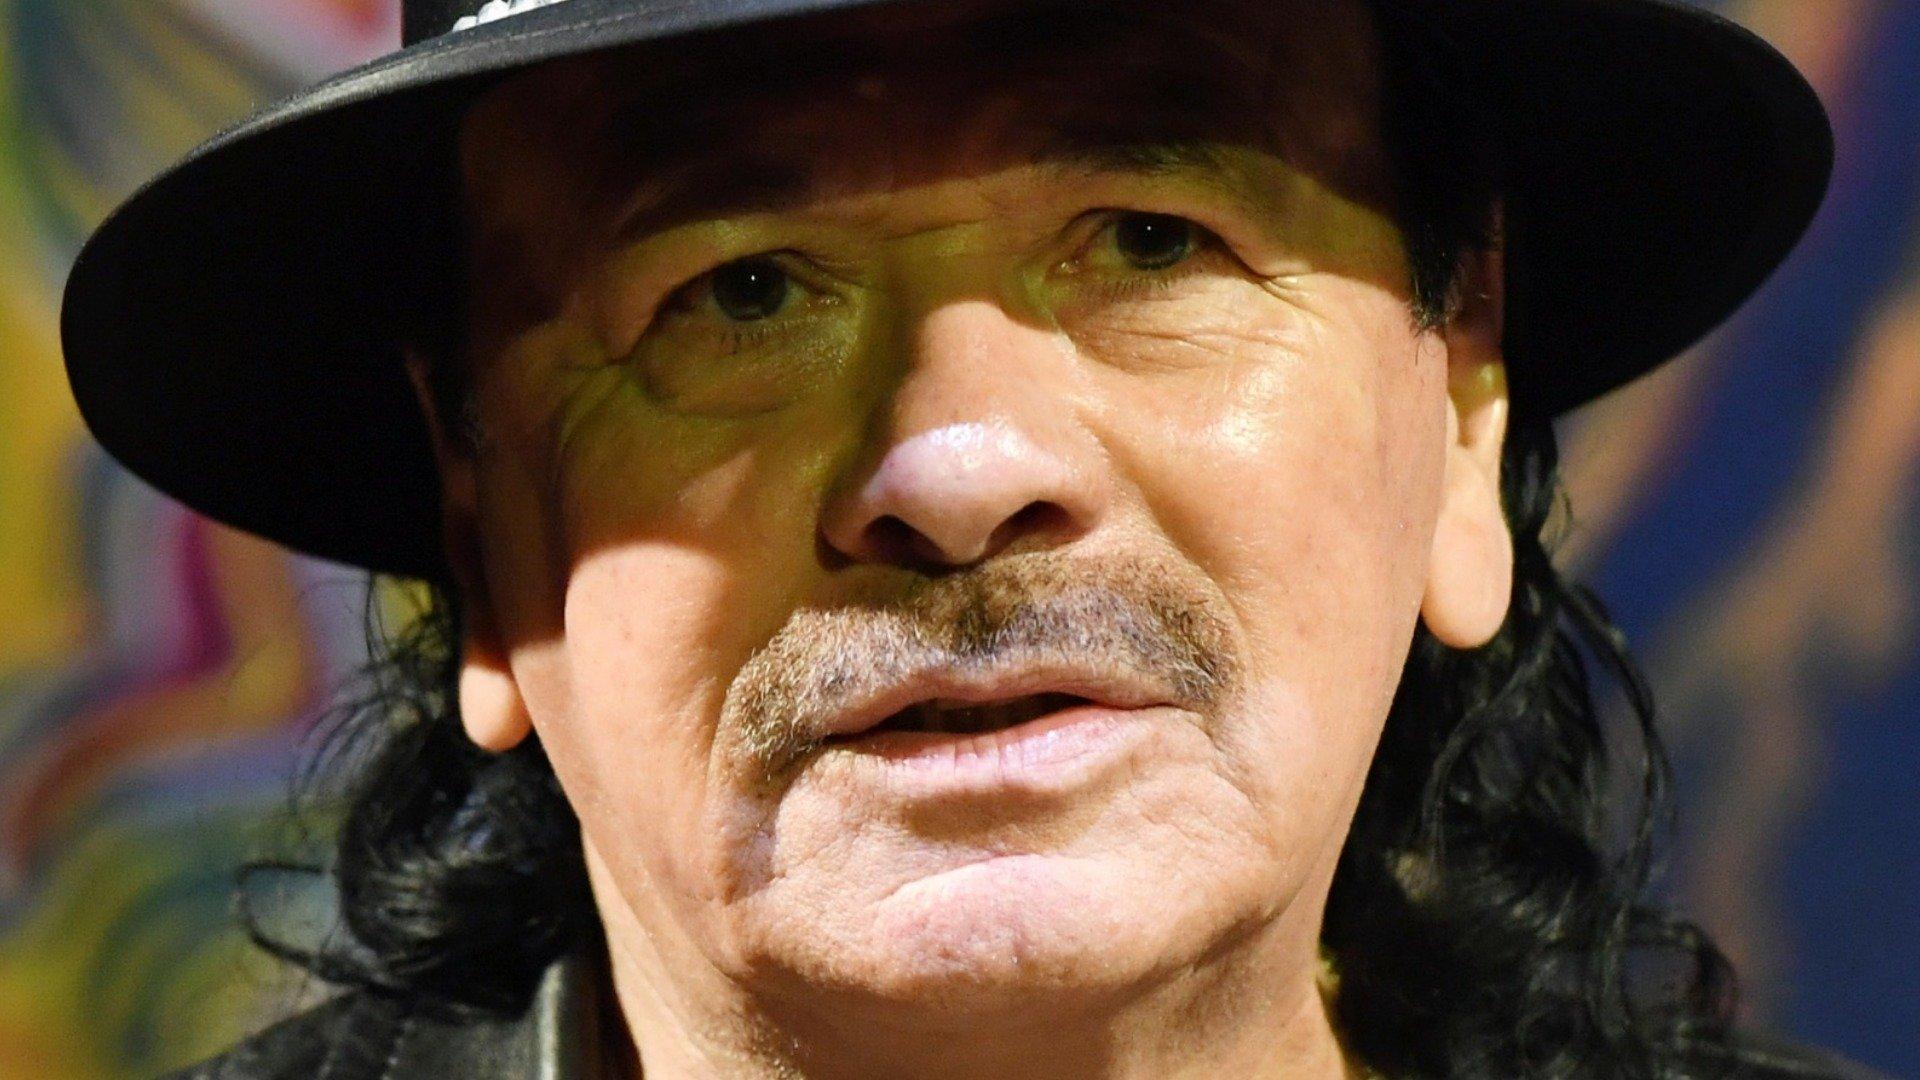 Tragic Details About Carlos Santana